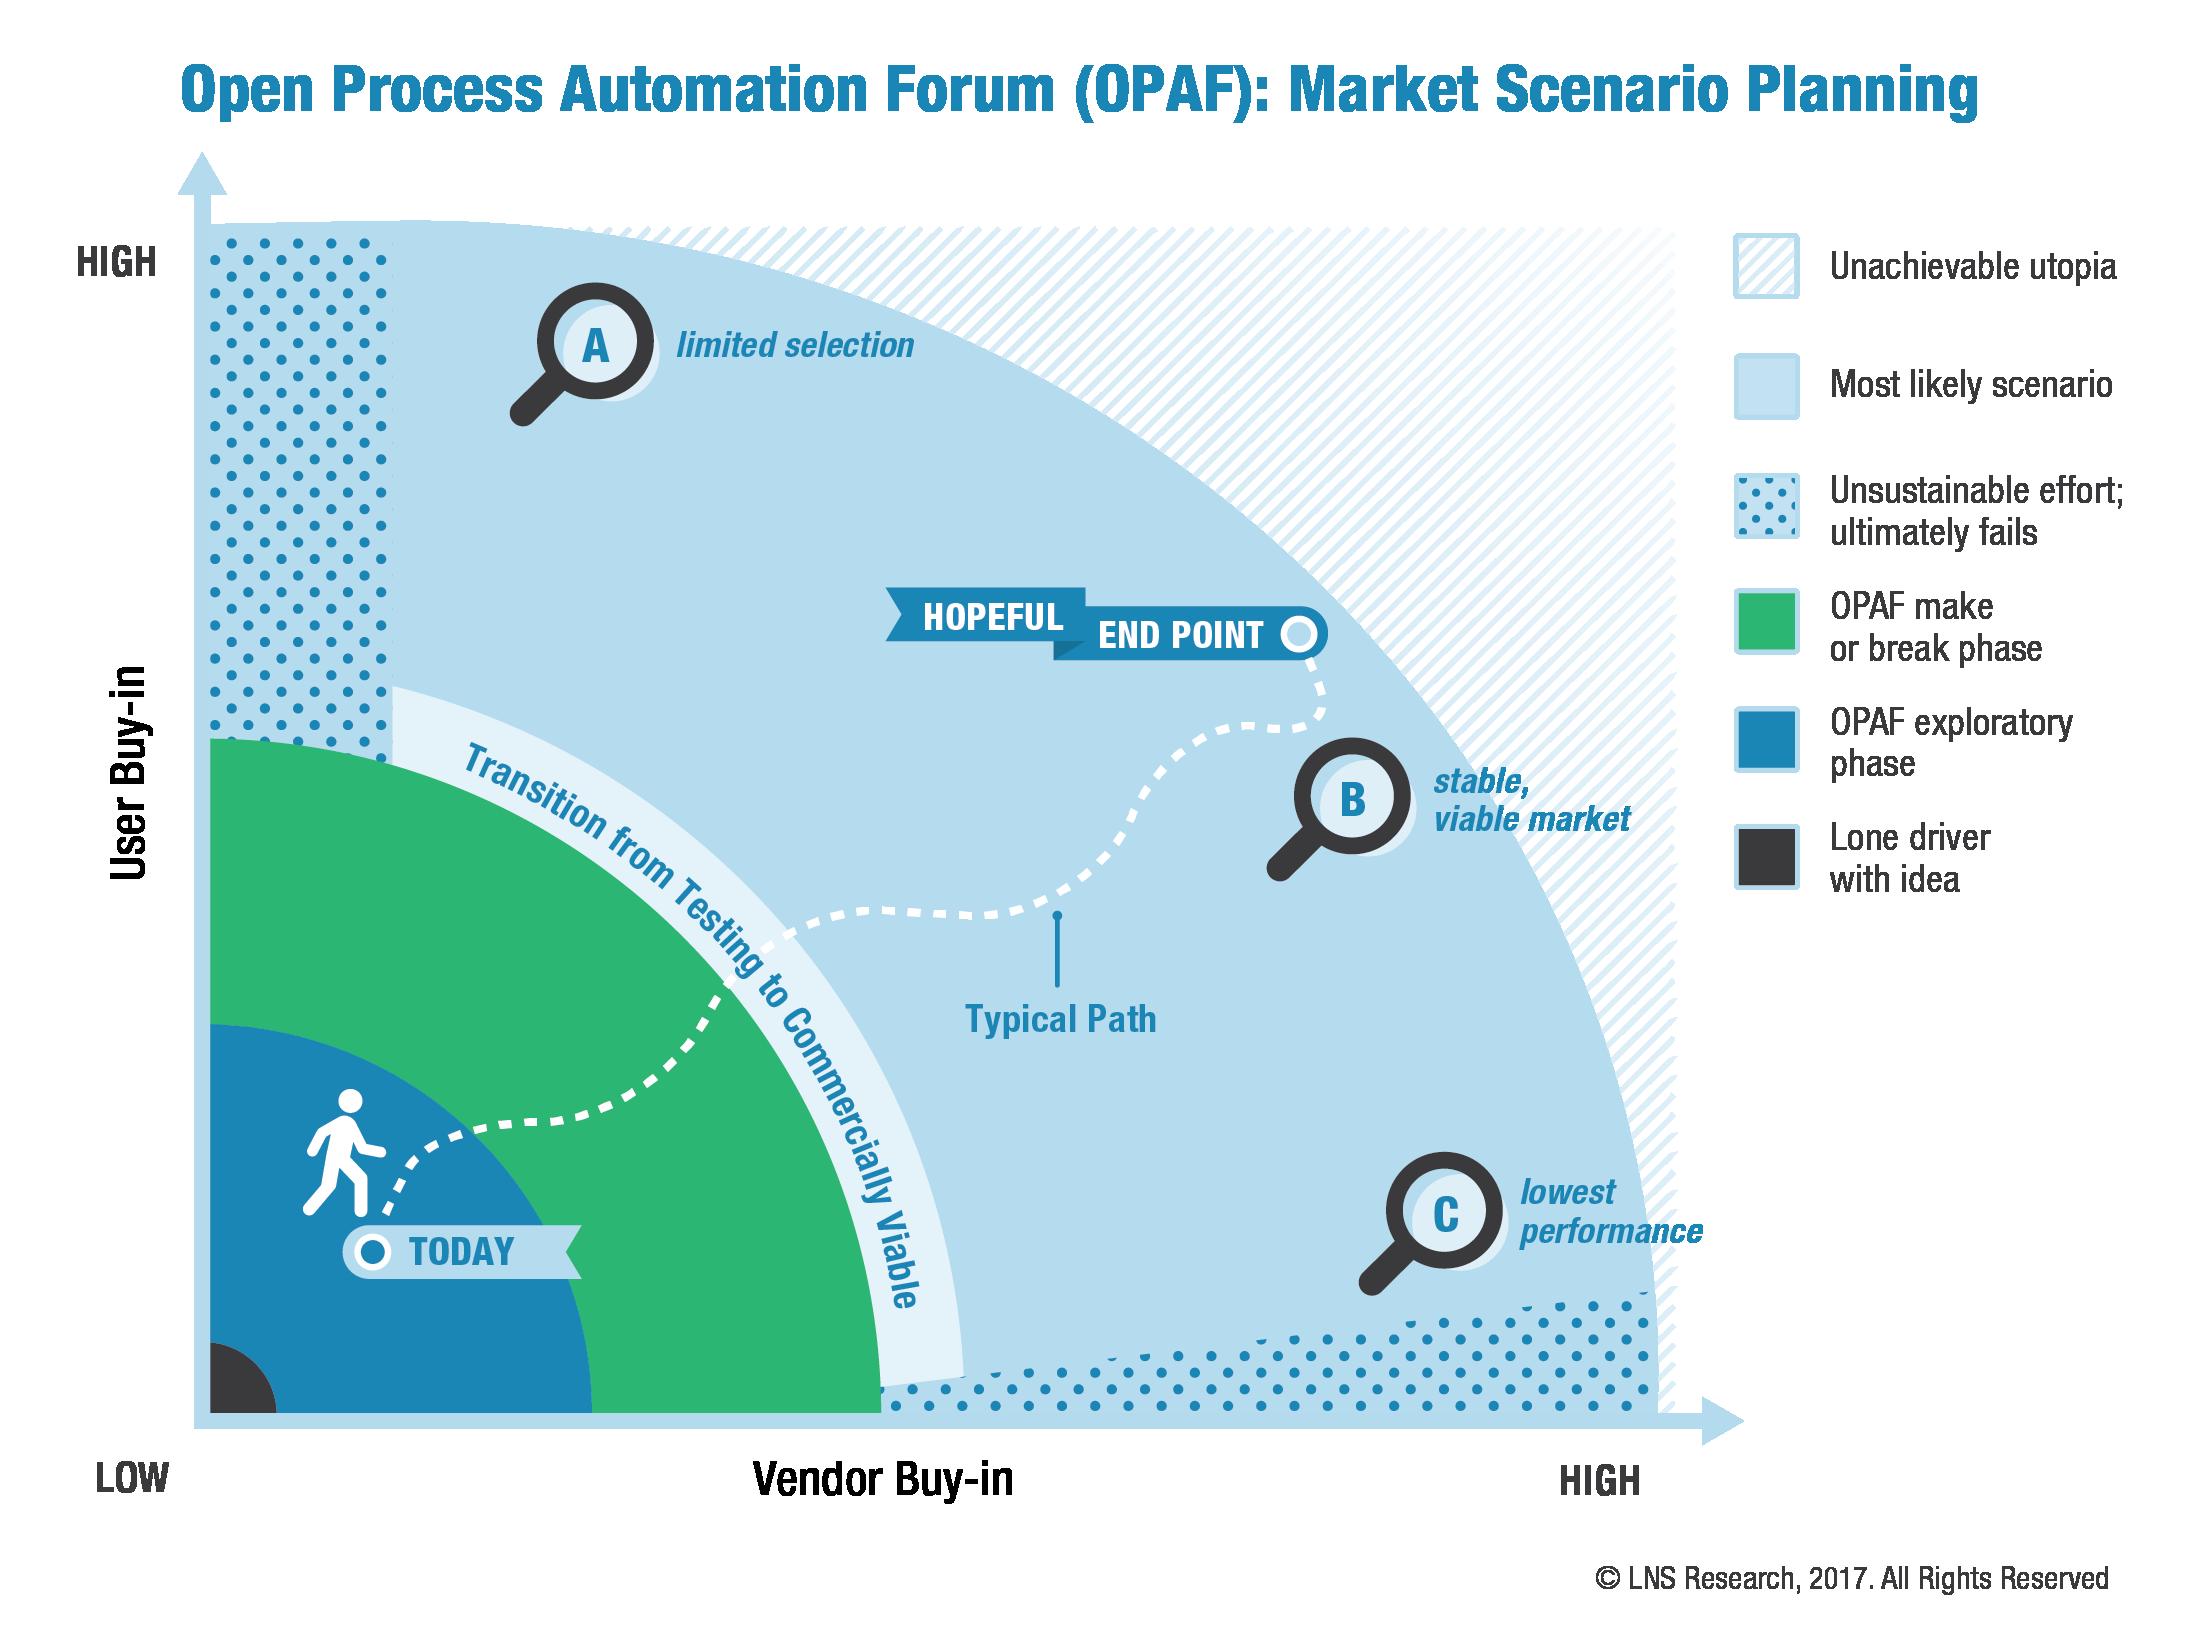 OPAF Market Scenario Planning